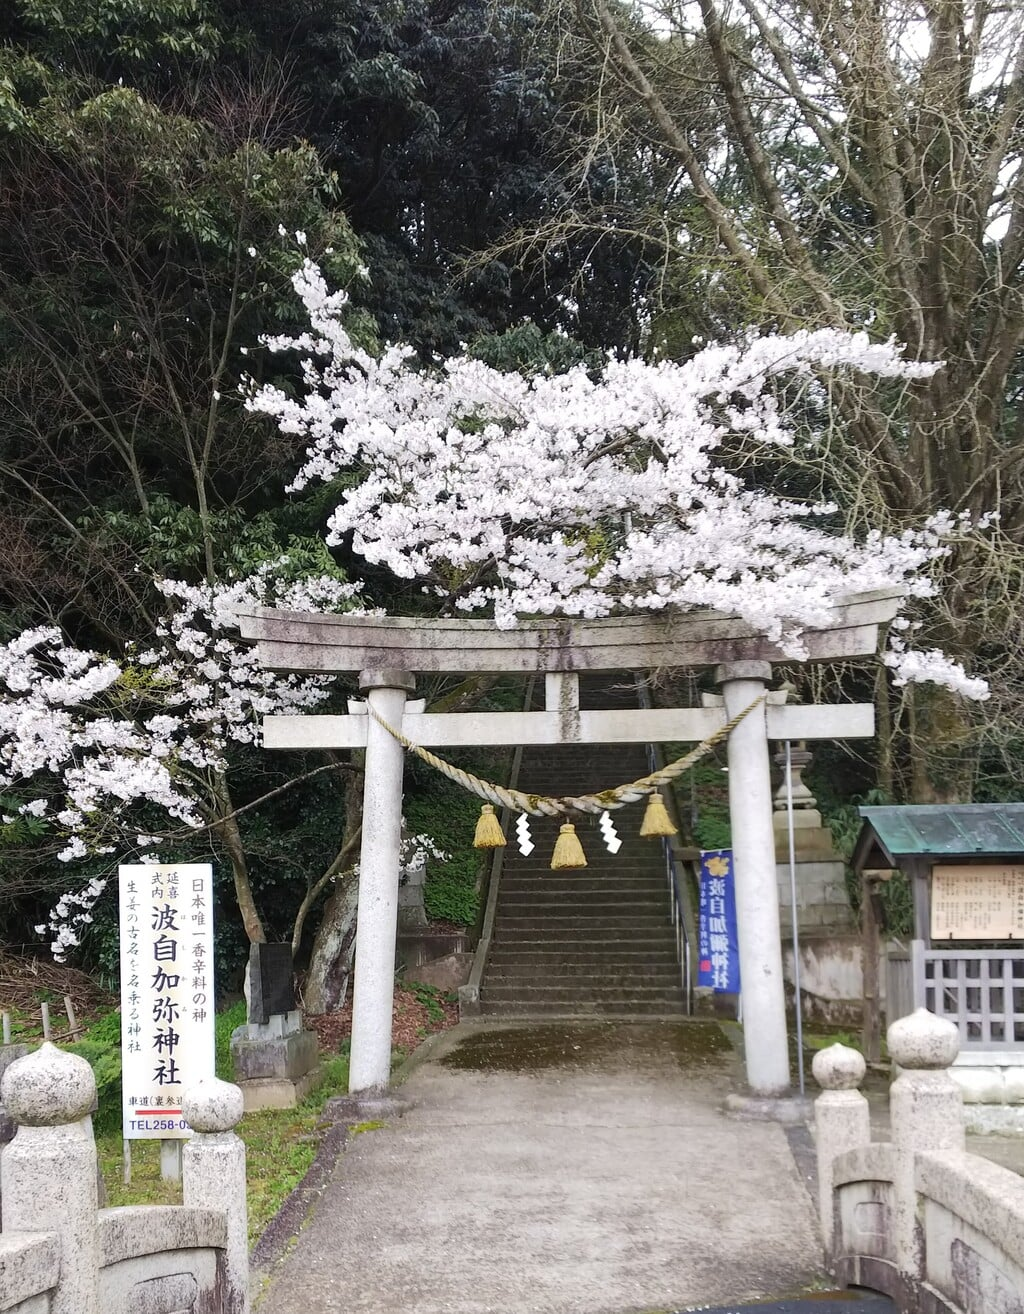 日本唯一香辛料の神 波自加彌神社の鳥居